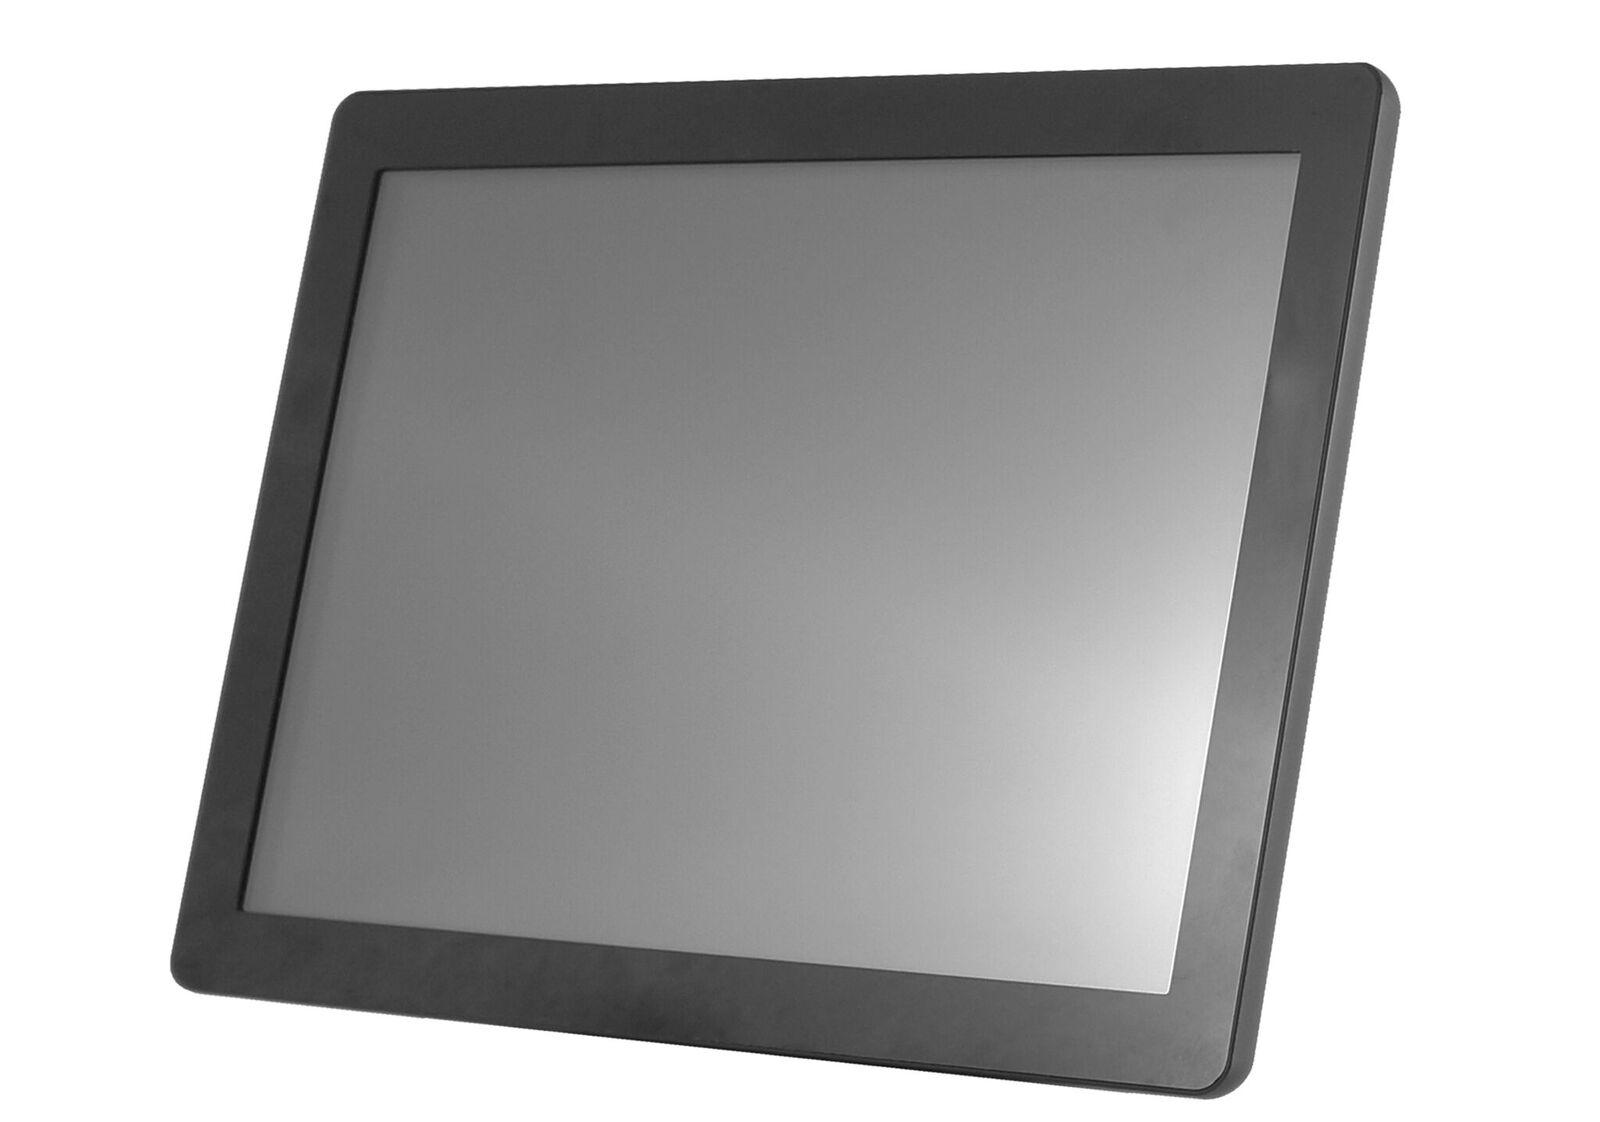 8'' Glass display - 800x600, 250nt, CAP, VGA